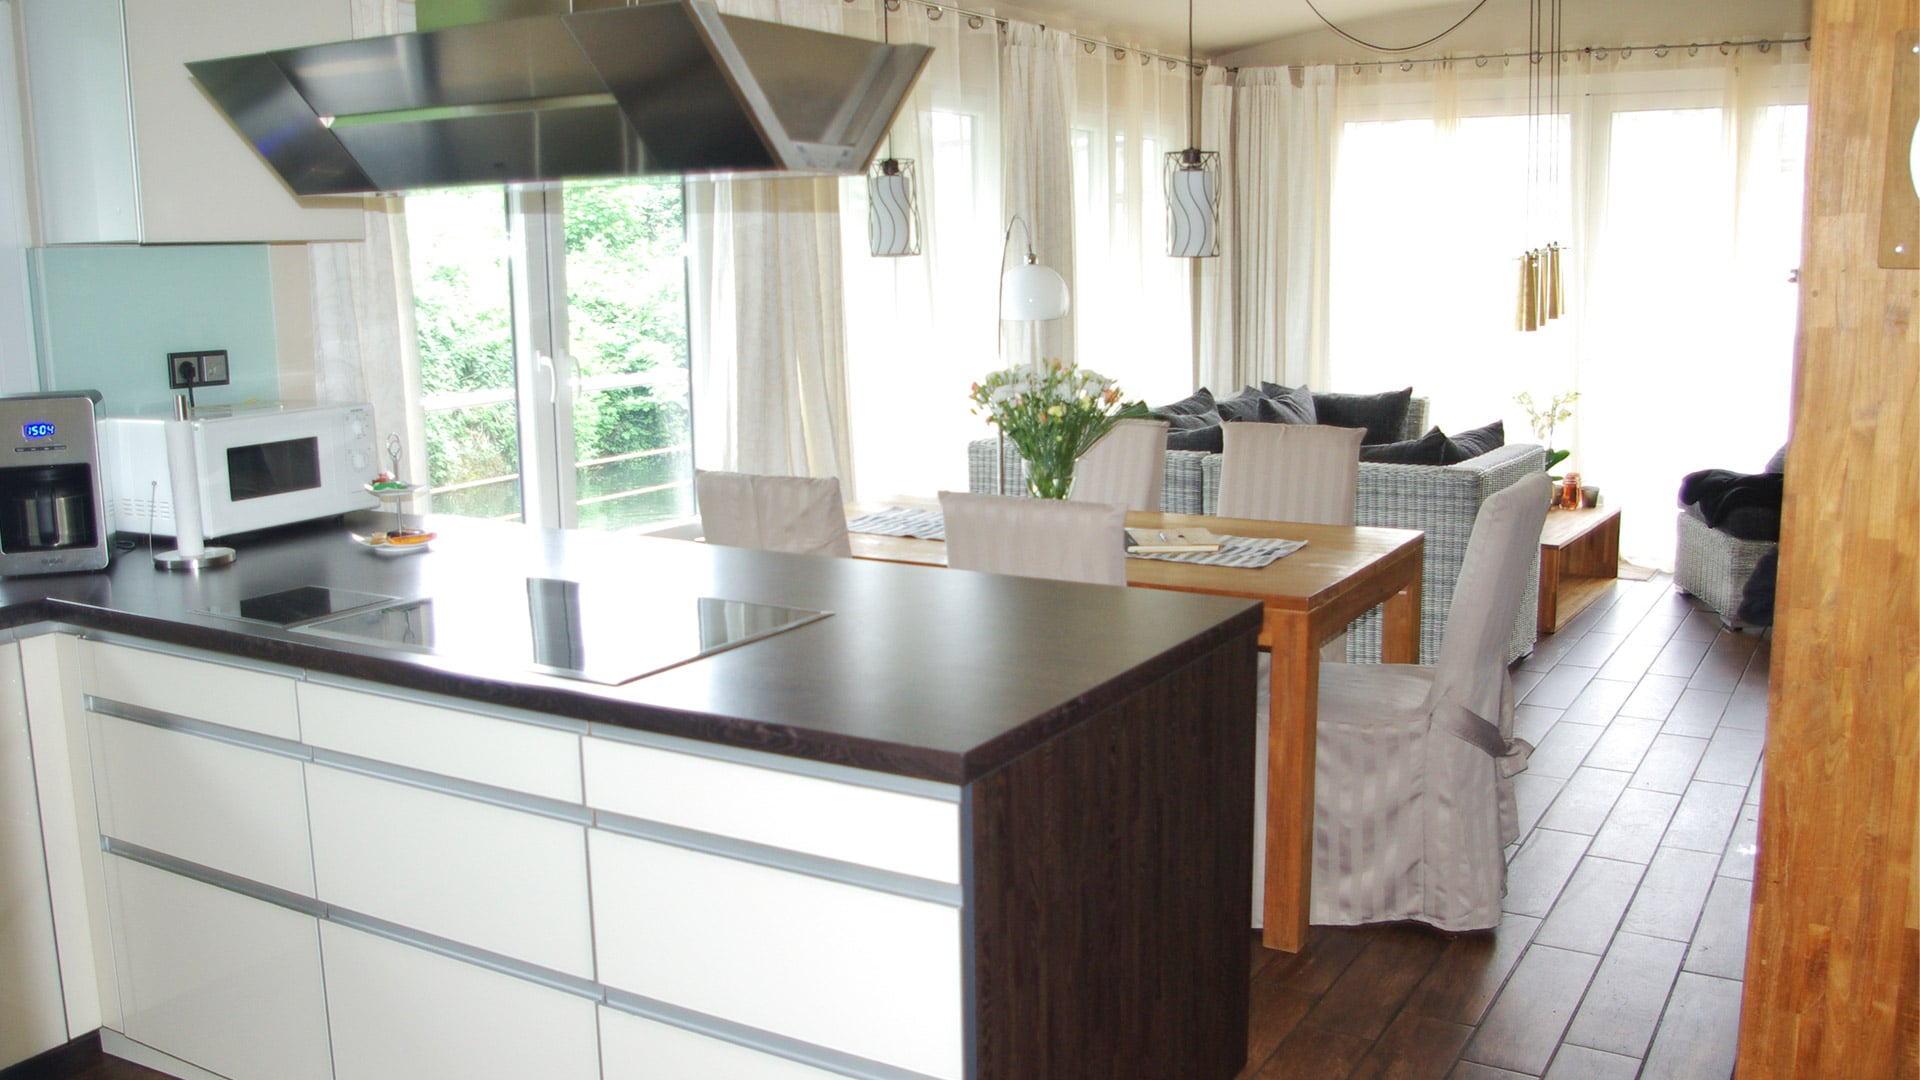 Peißnitz Wohnküche